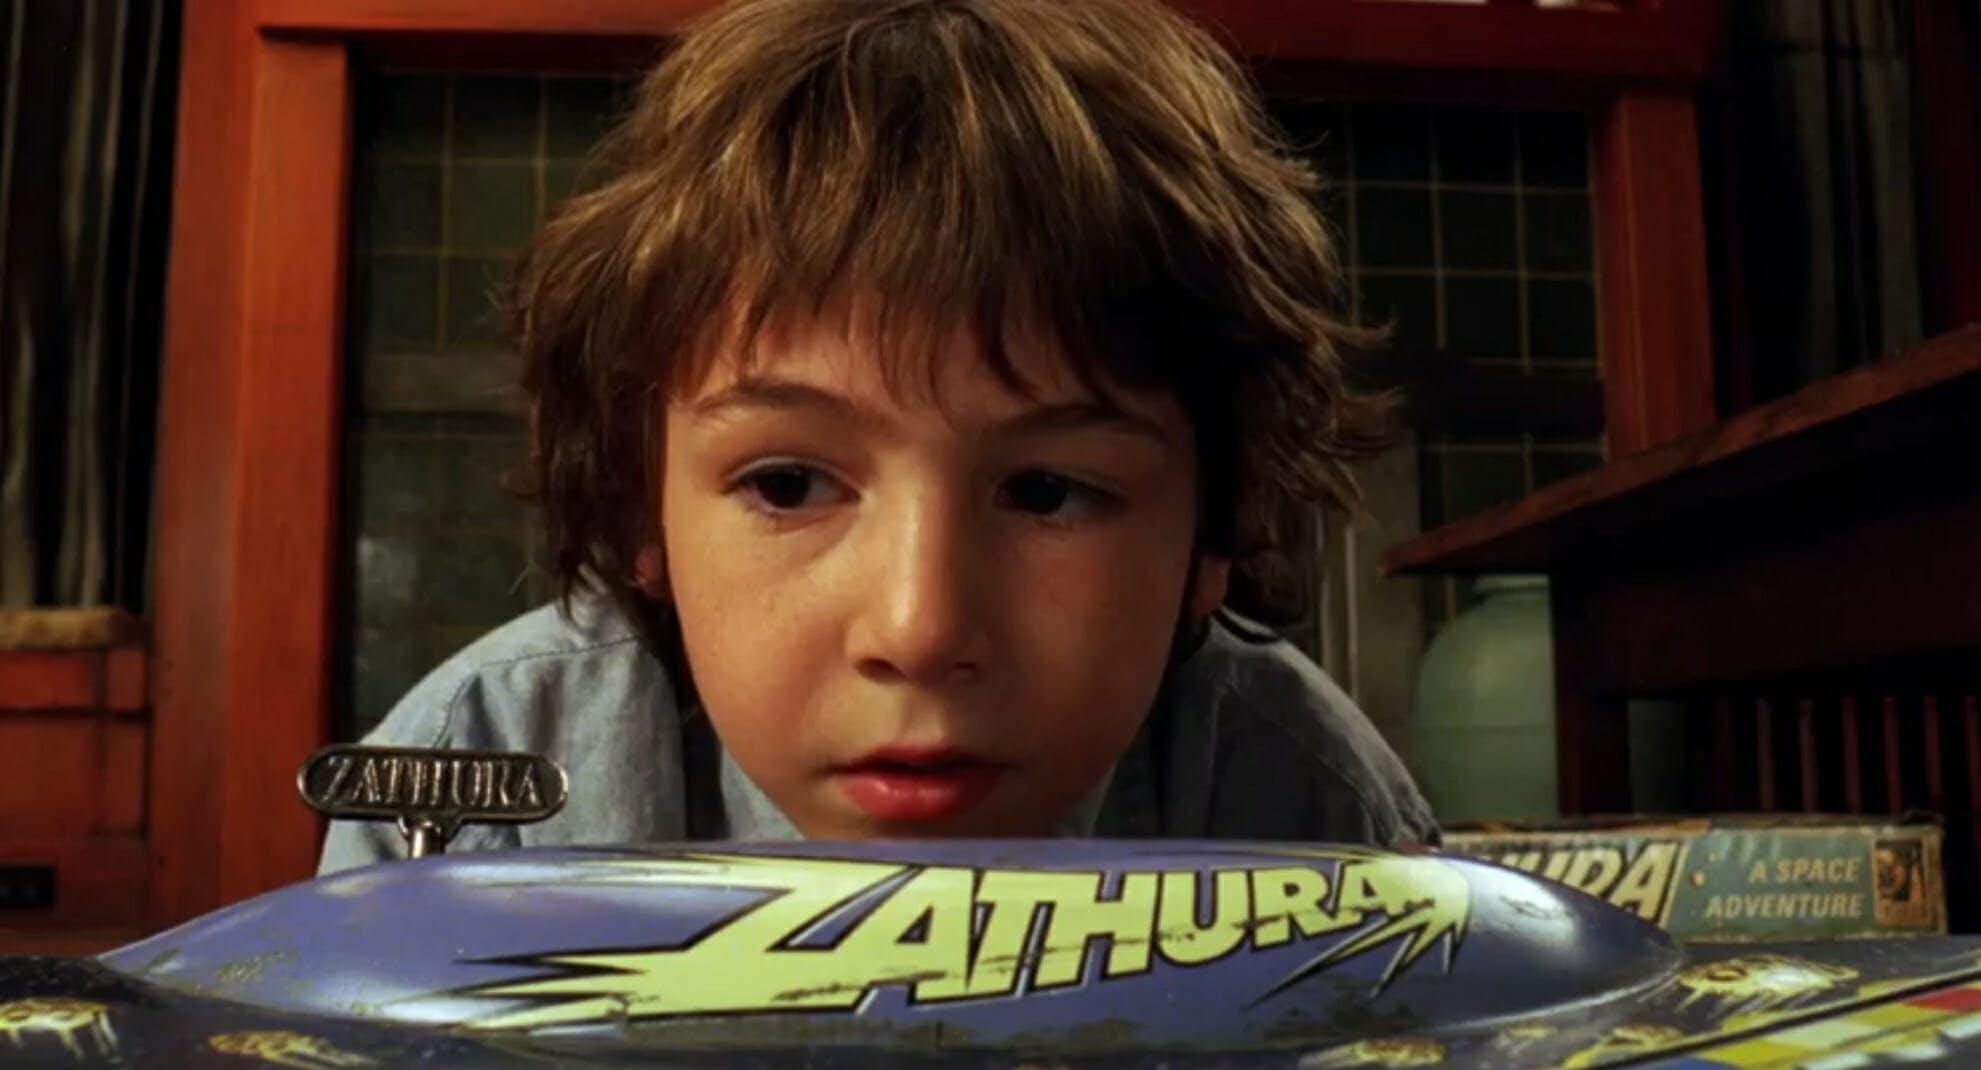 Amazon kids movies - zathura